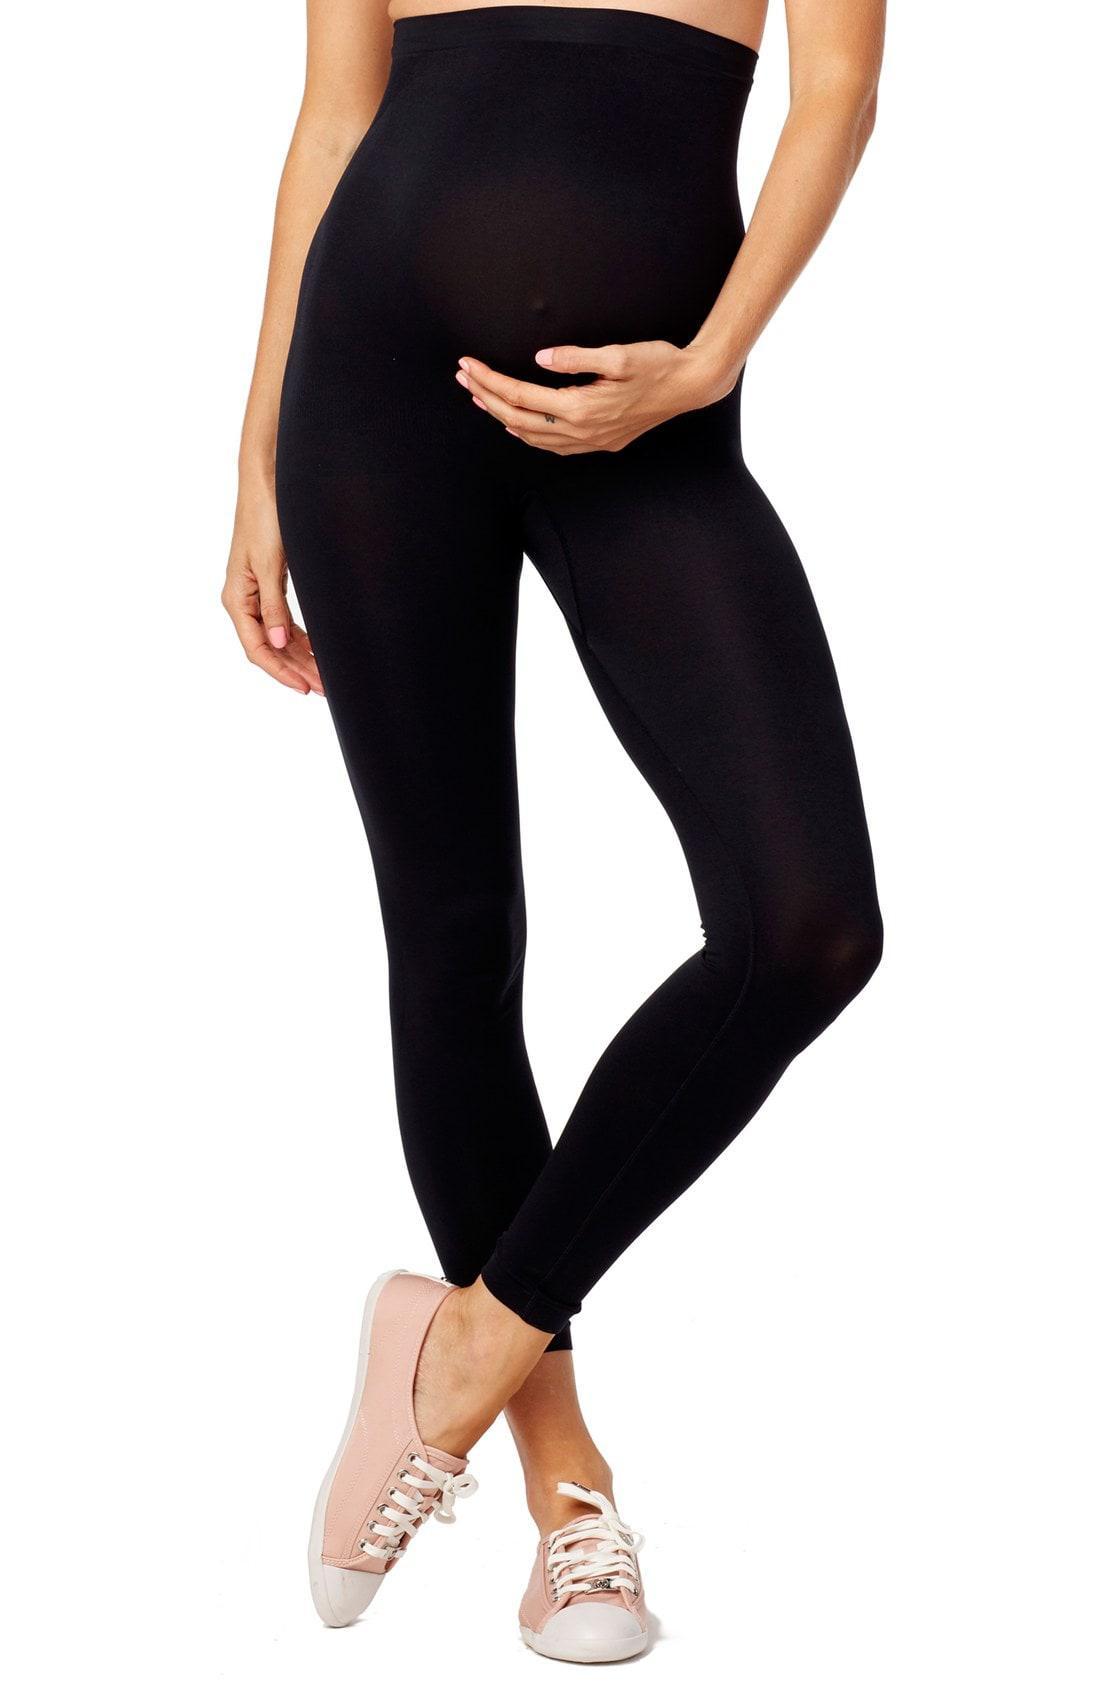 b6dda44c1d5aa Rosie Pope Seamless Maternity Leggings in Black - Lyst